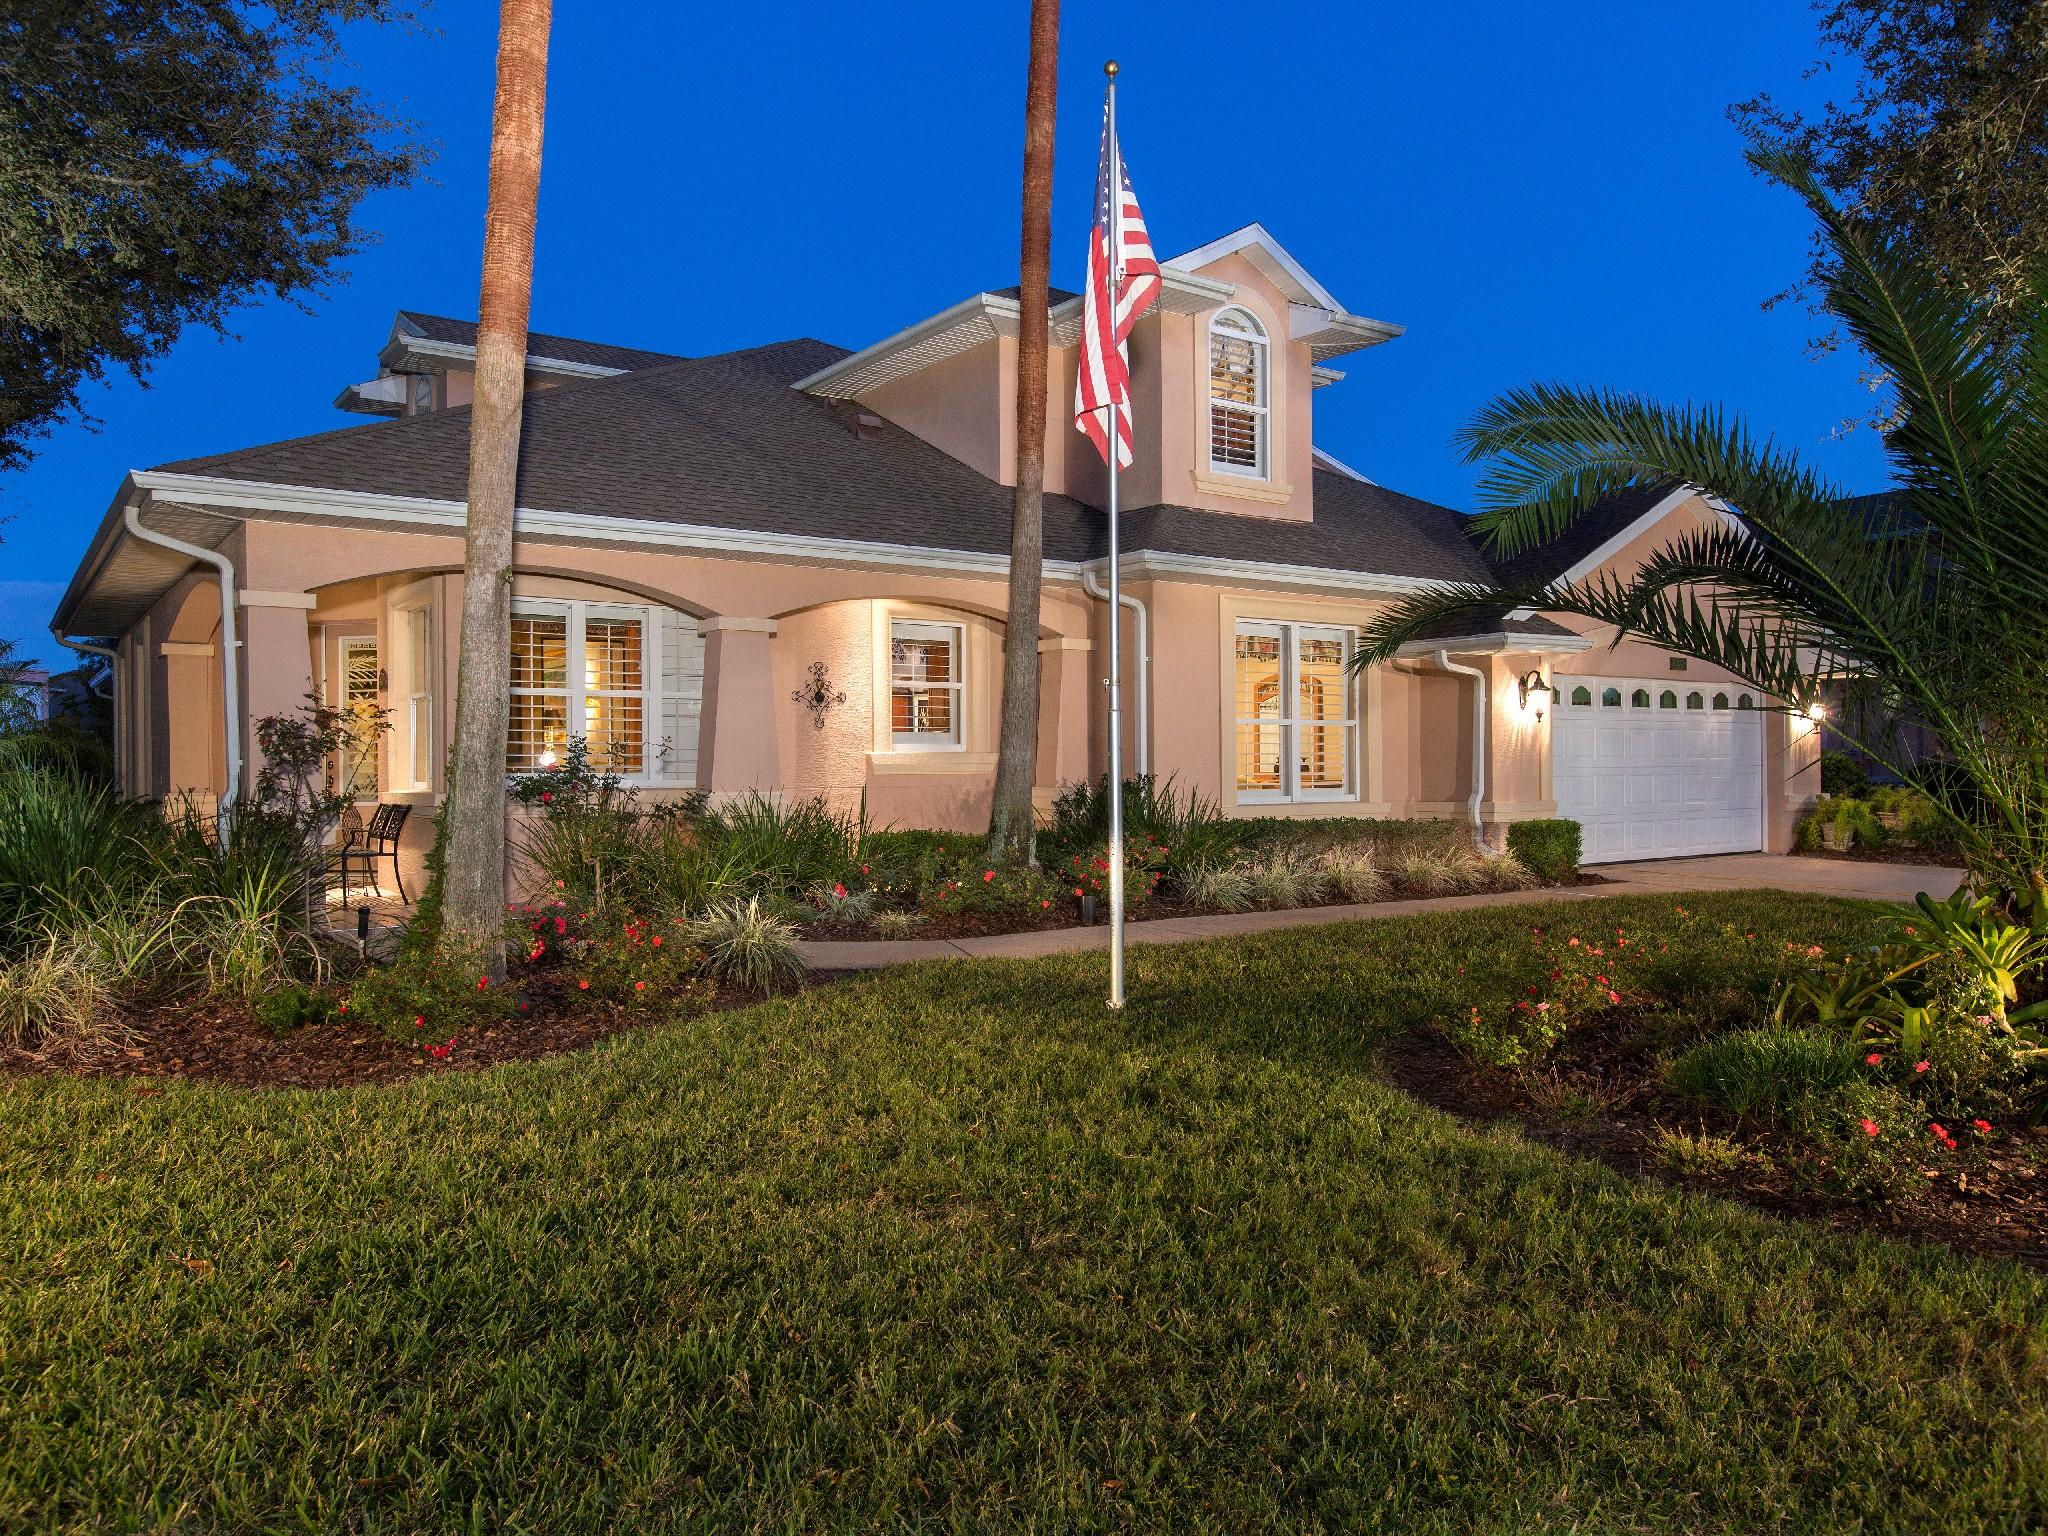 Condominium for Sale at Daytona Beach, Florida 1892 Clubhouse Drive Port Orange, Florida 32128 United States